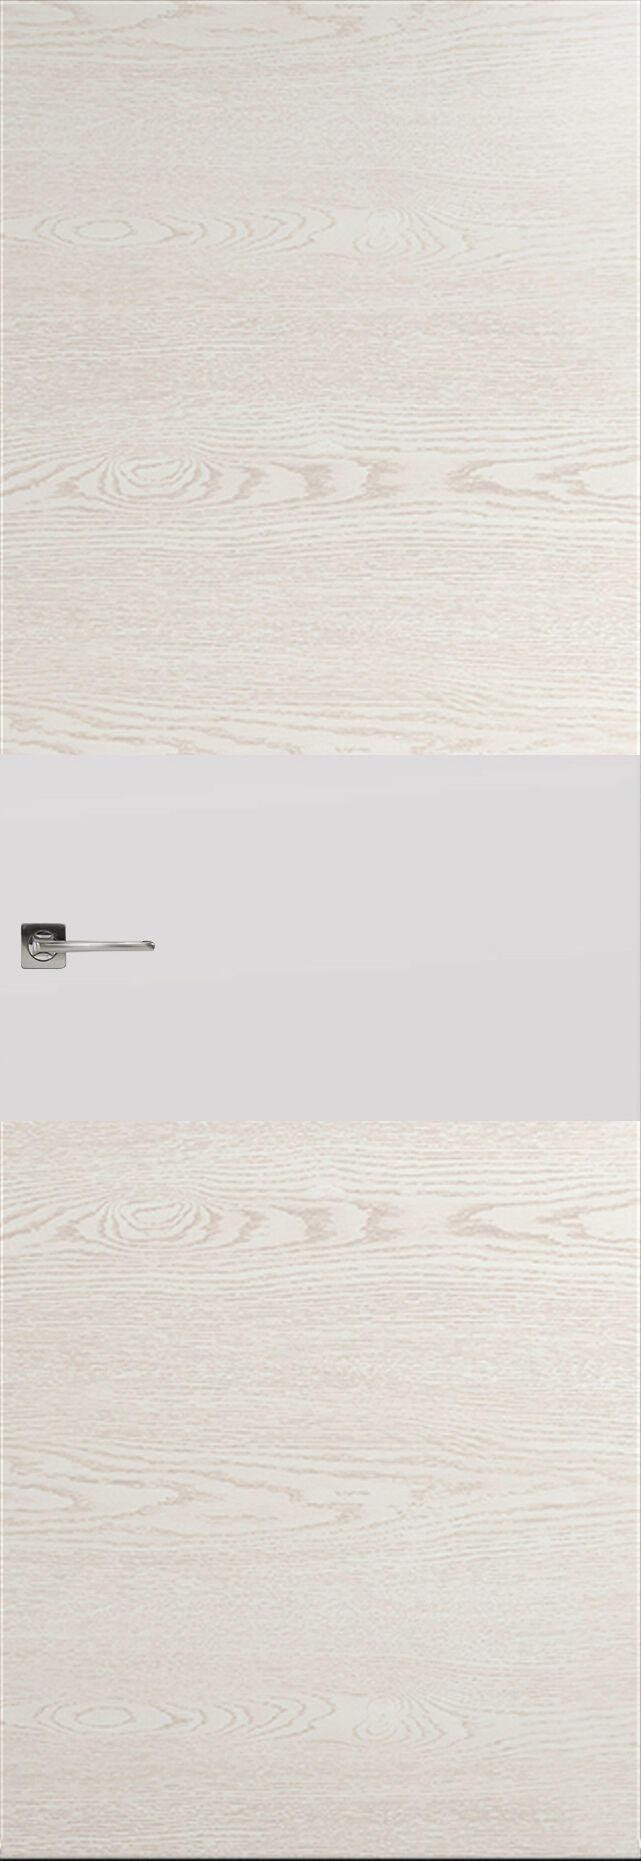 Tivoli Е-4 Невидимка цвет - Белый ясень Без стекла (ДГ)